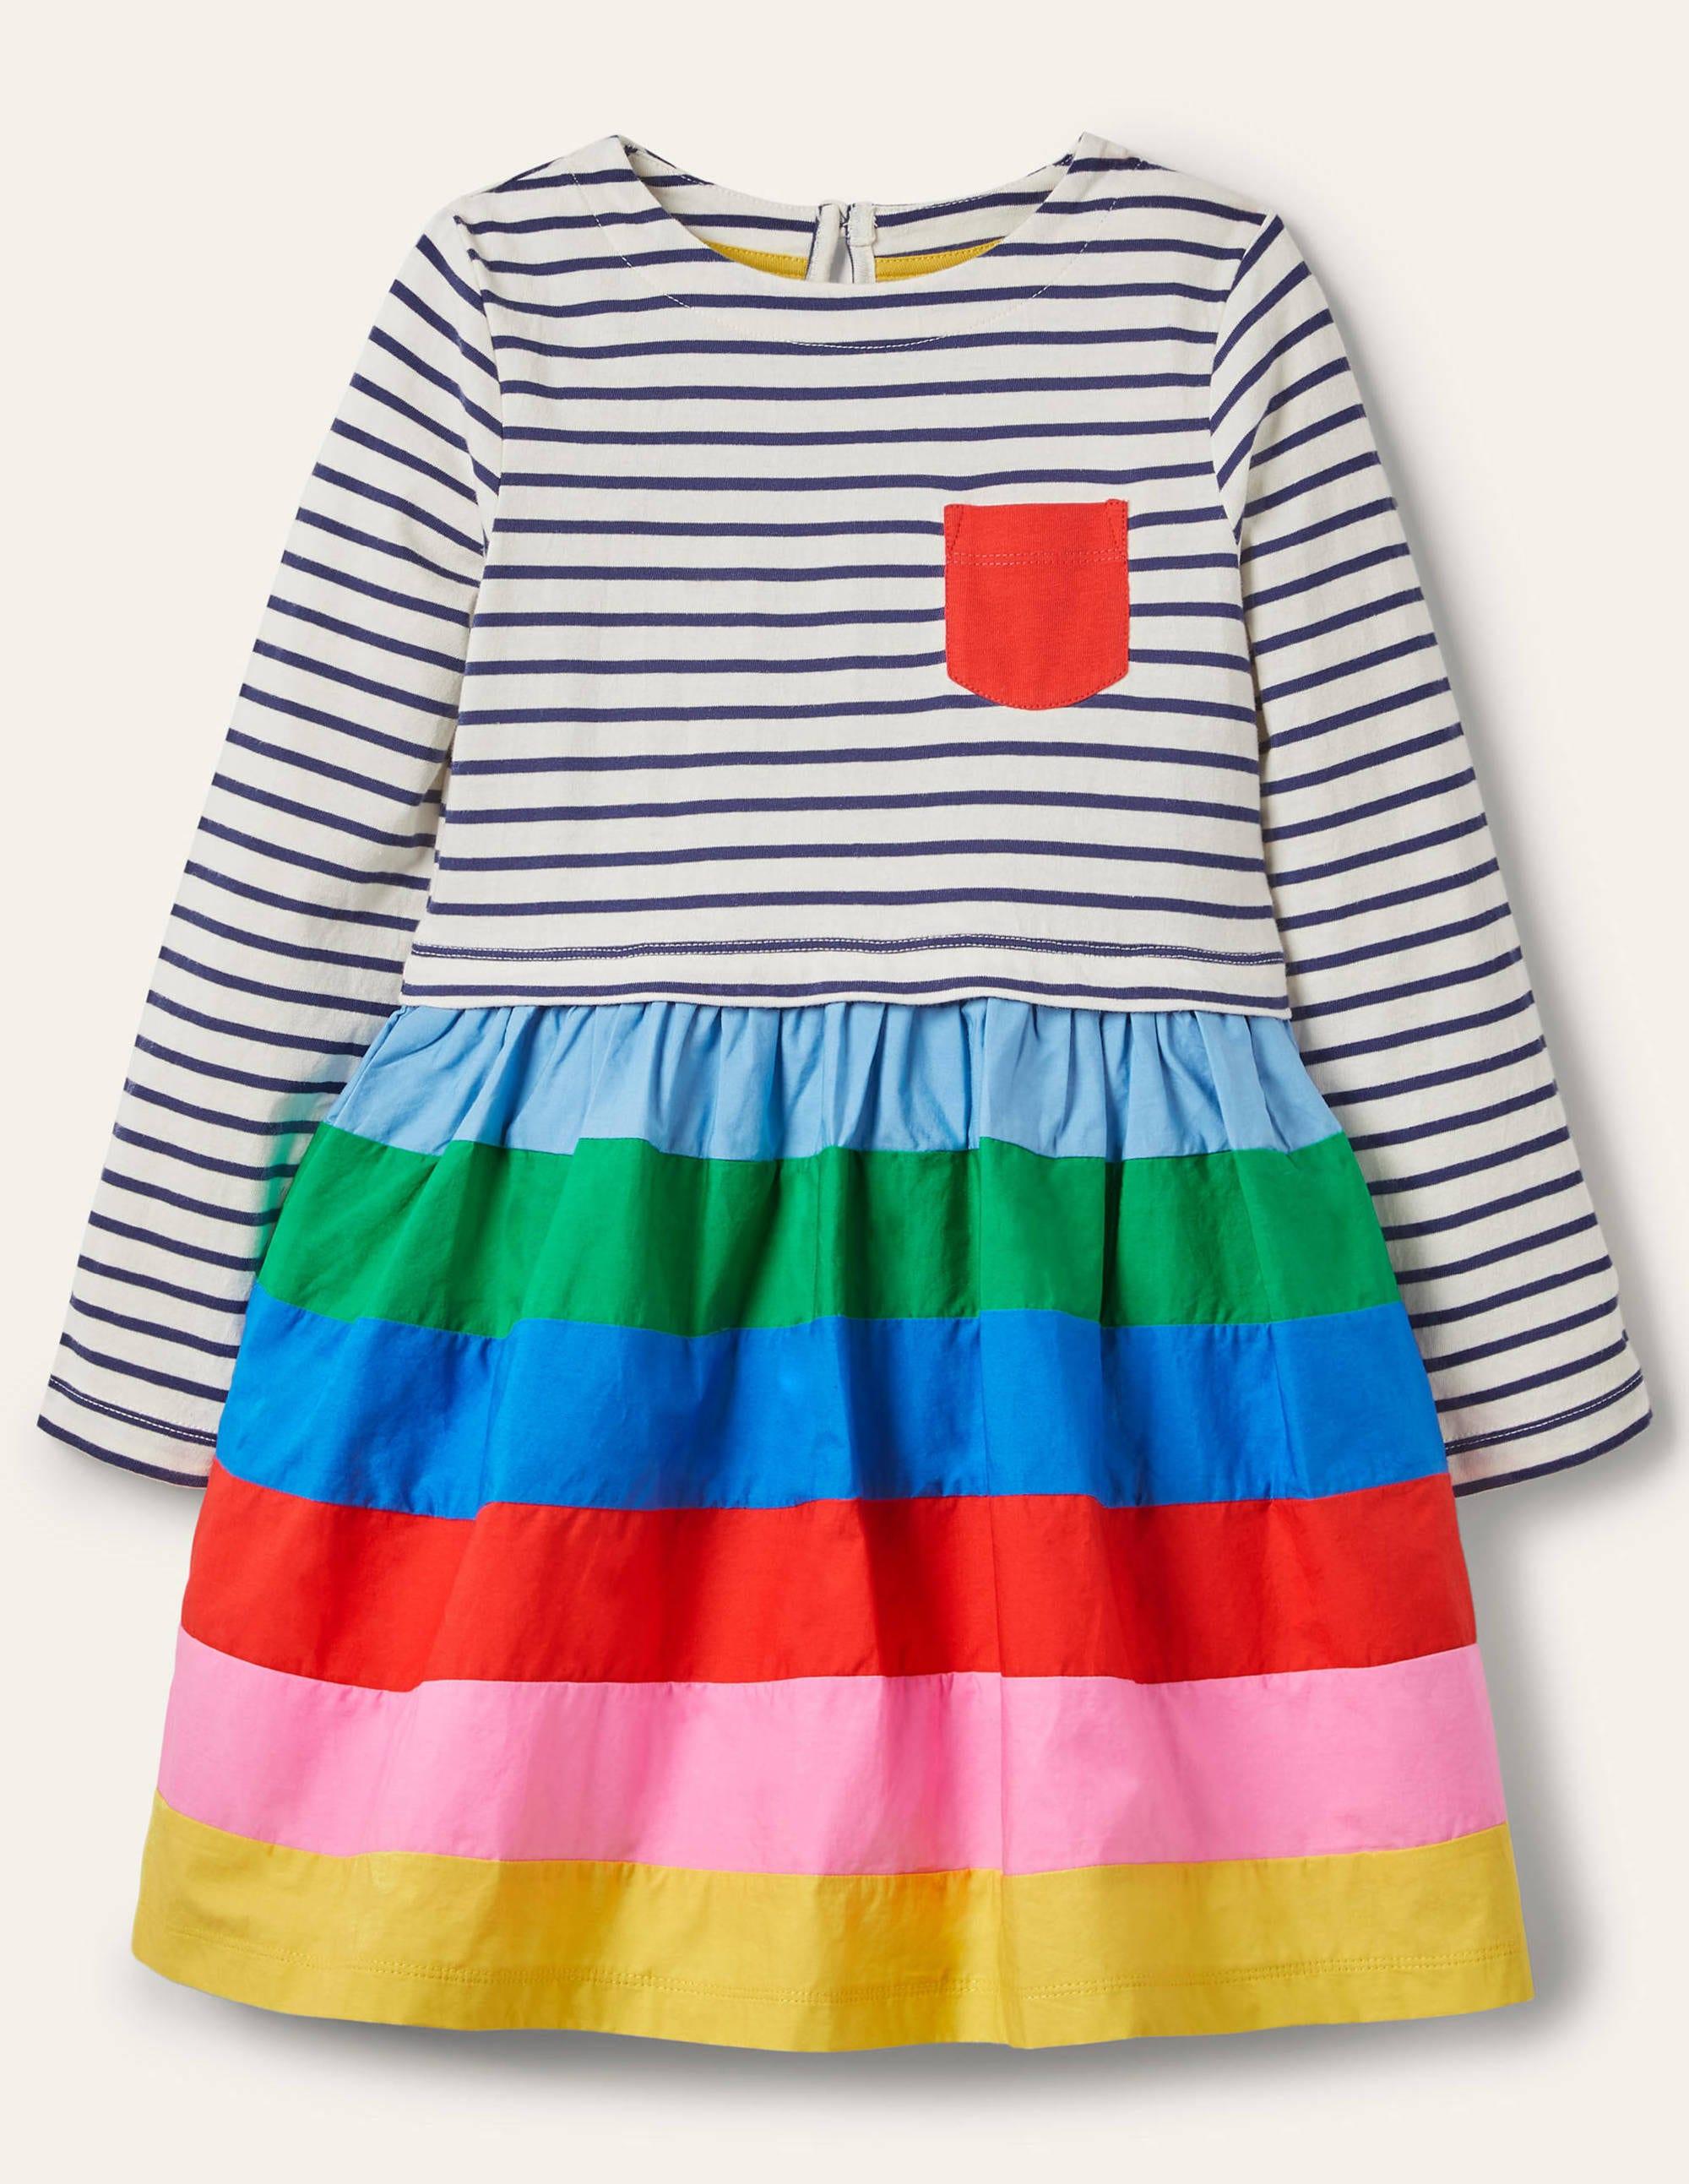 Boden Hotchpotch Dress - Ivory/ Starboard Blue Rainbow